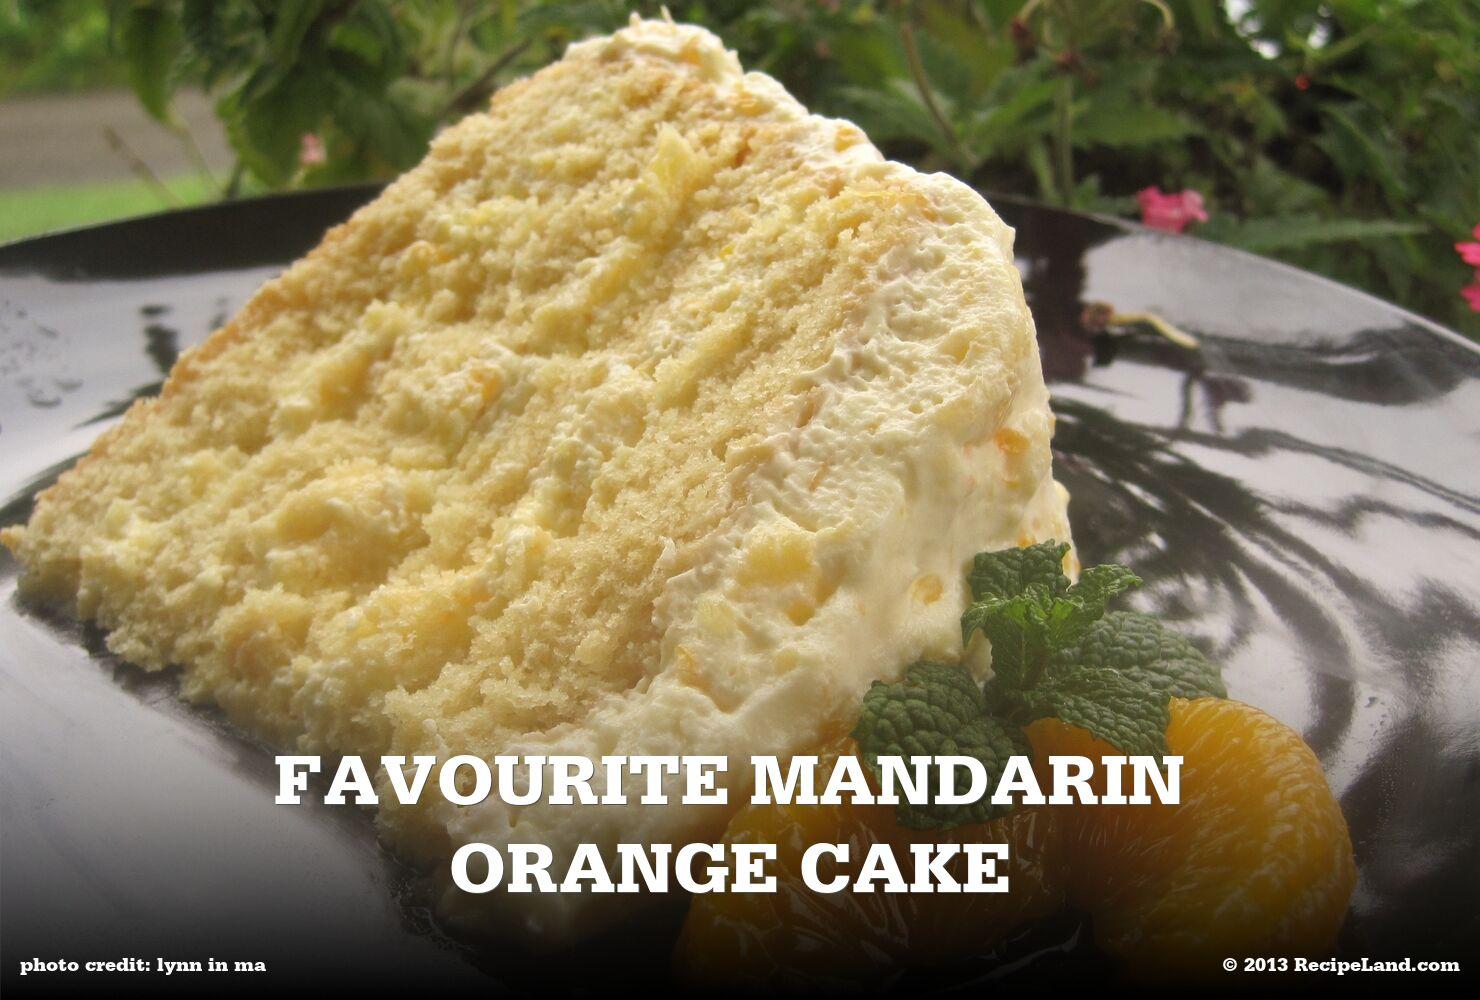 Favourite Mandarin Orange Cake